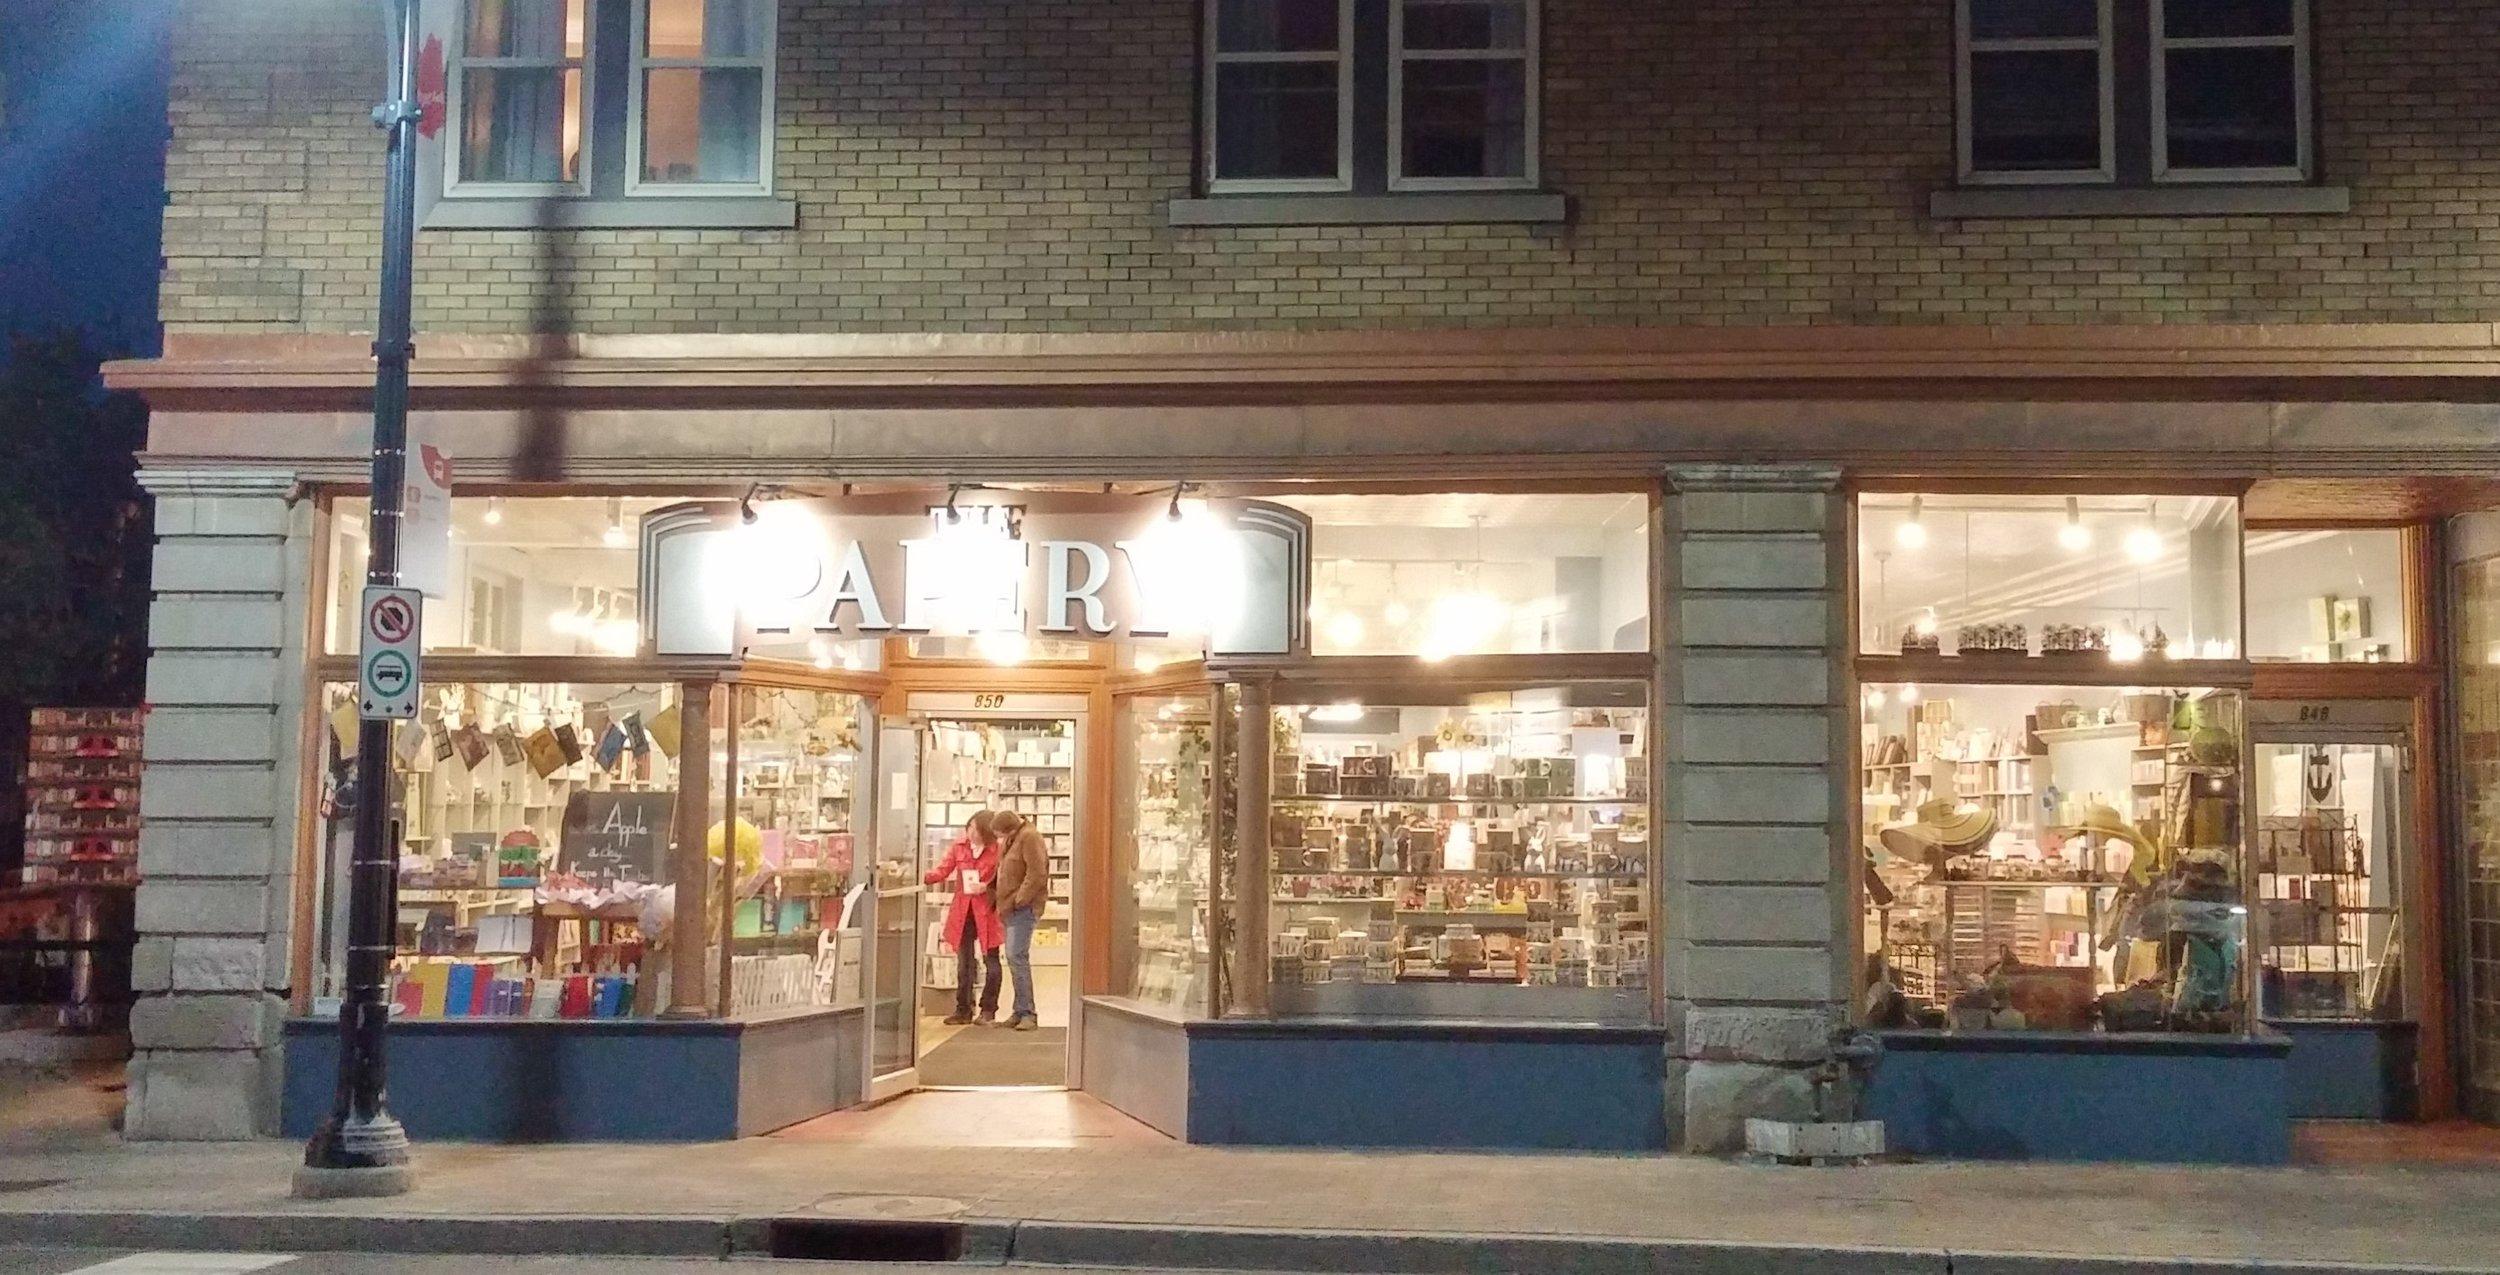 Storefront_at_night